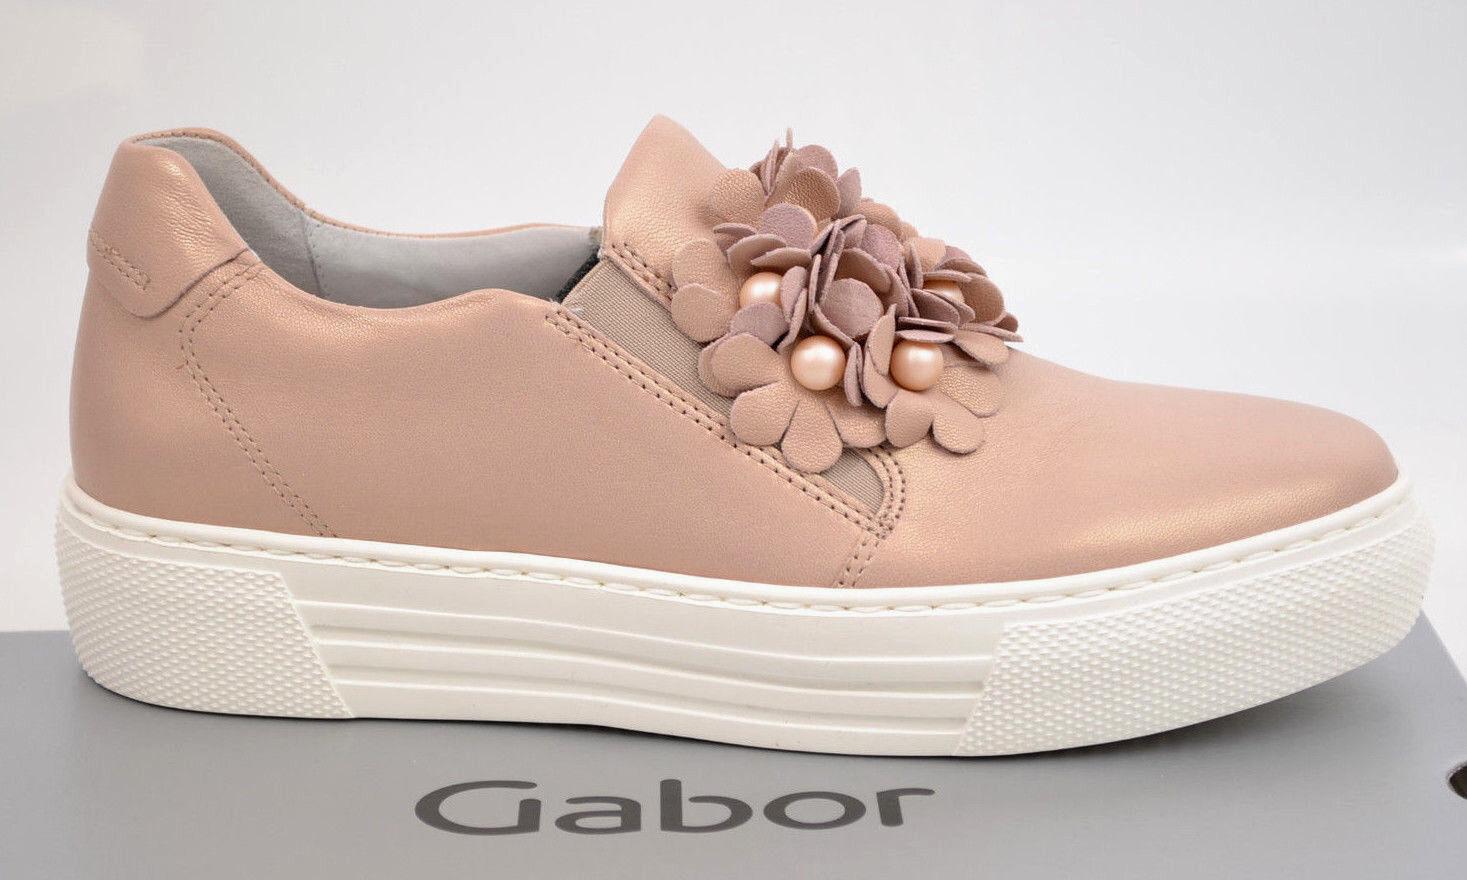 Gabor comfort Sneaker Damenschuhe Slipper Schuhe  rose Perlen NEU FS18  Schuhe 86.462.53 d00fb2